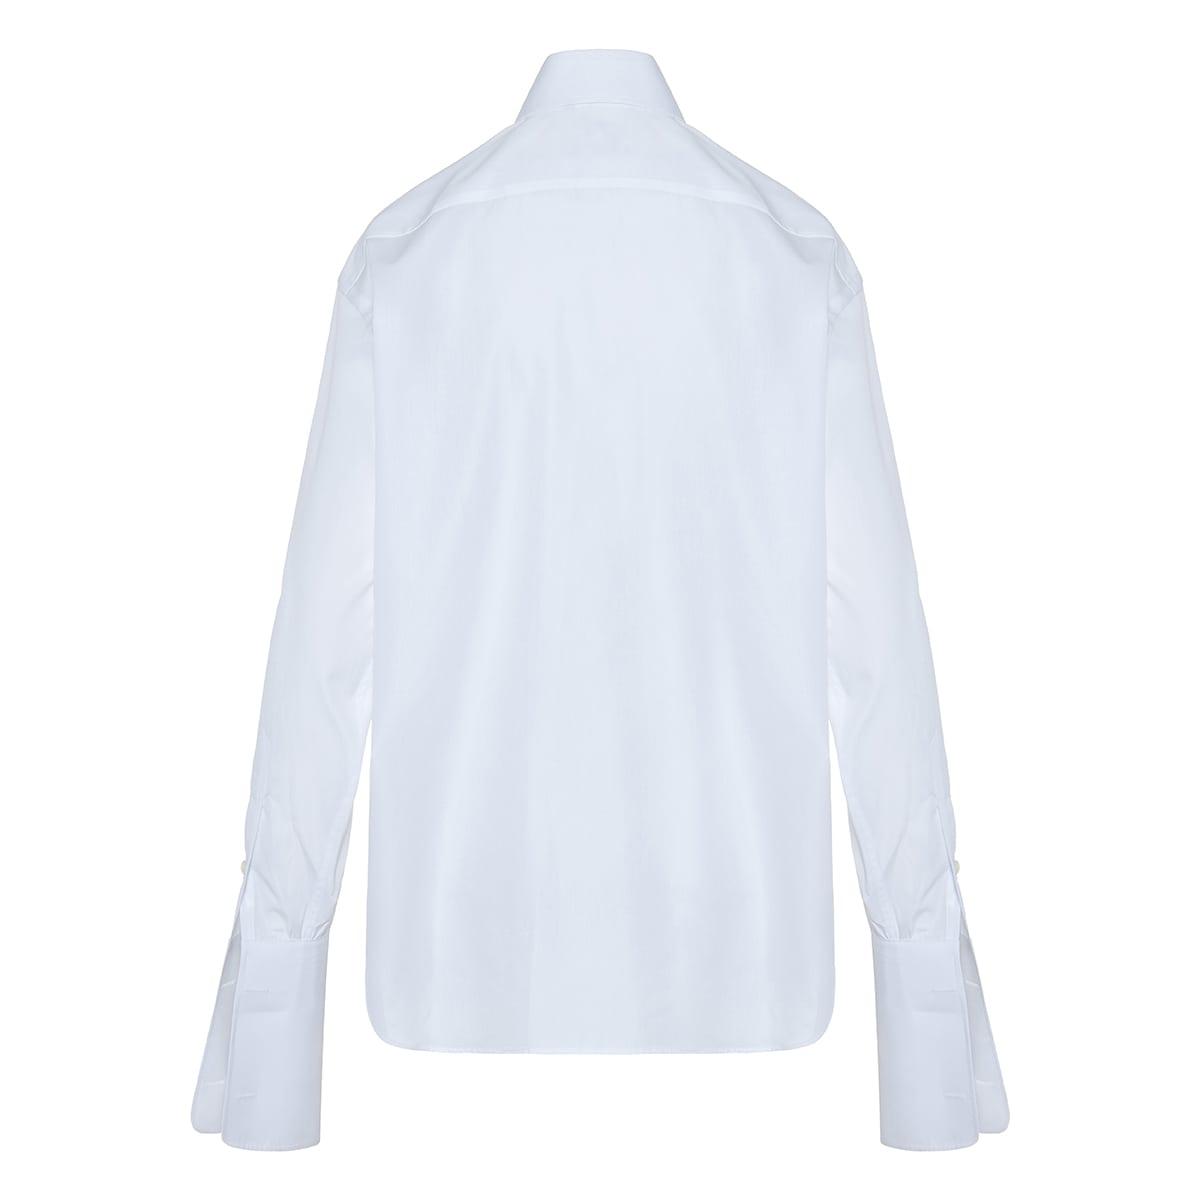 Signature oversized poplin shirt